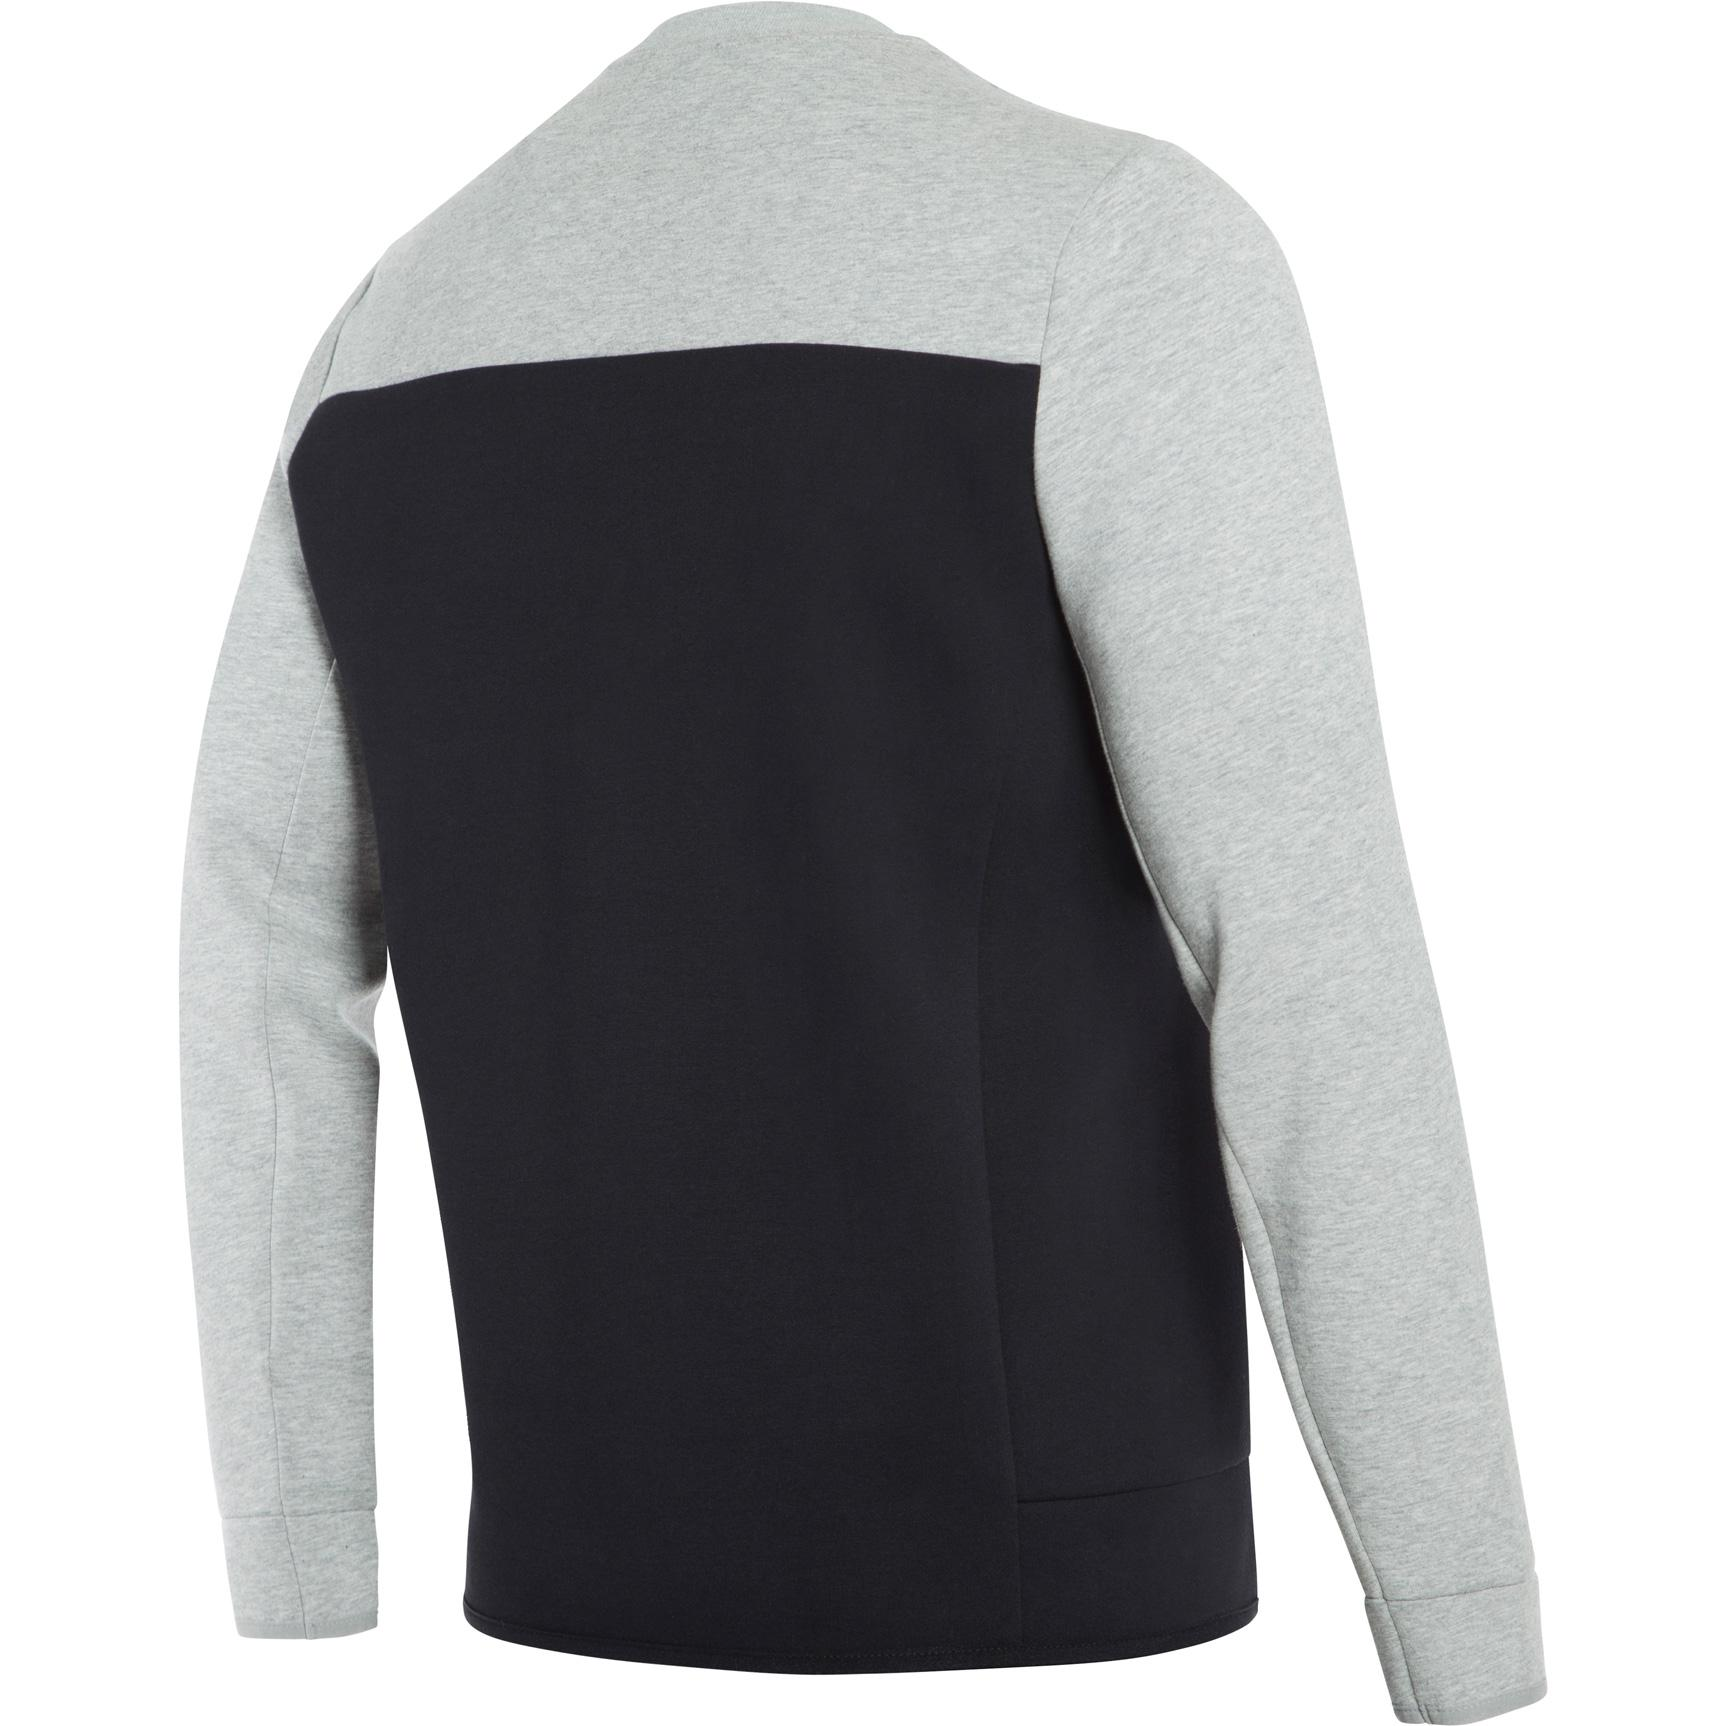 DAINESE-t-shirt-contrast-sweatshirt-image-10938899